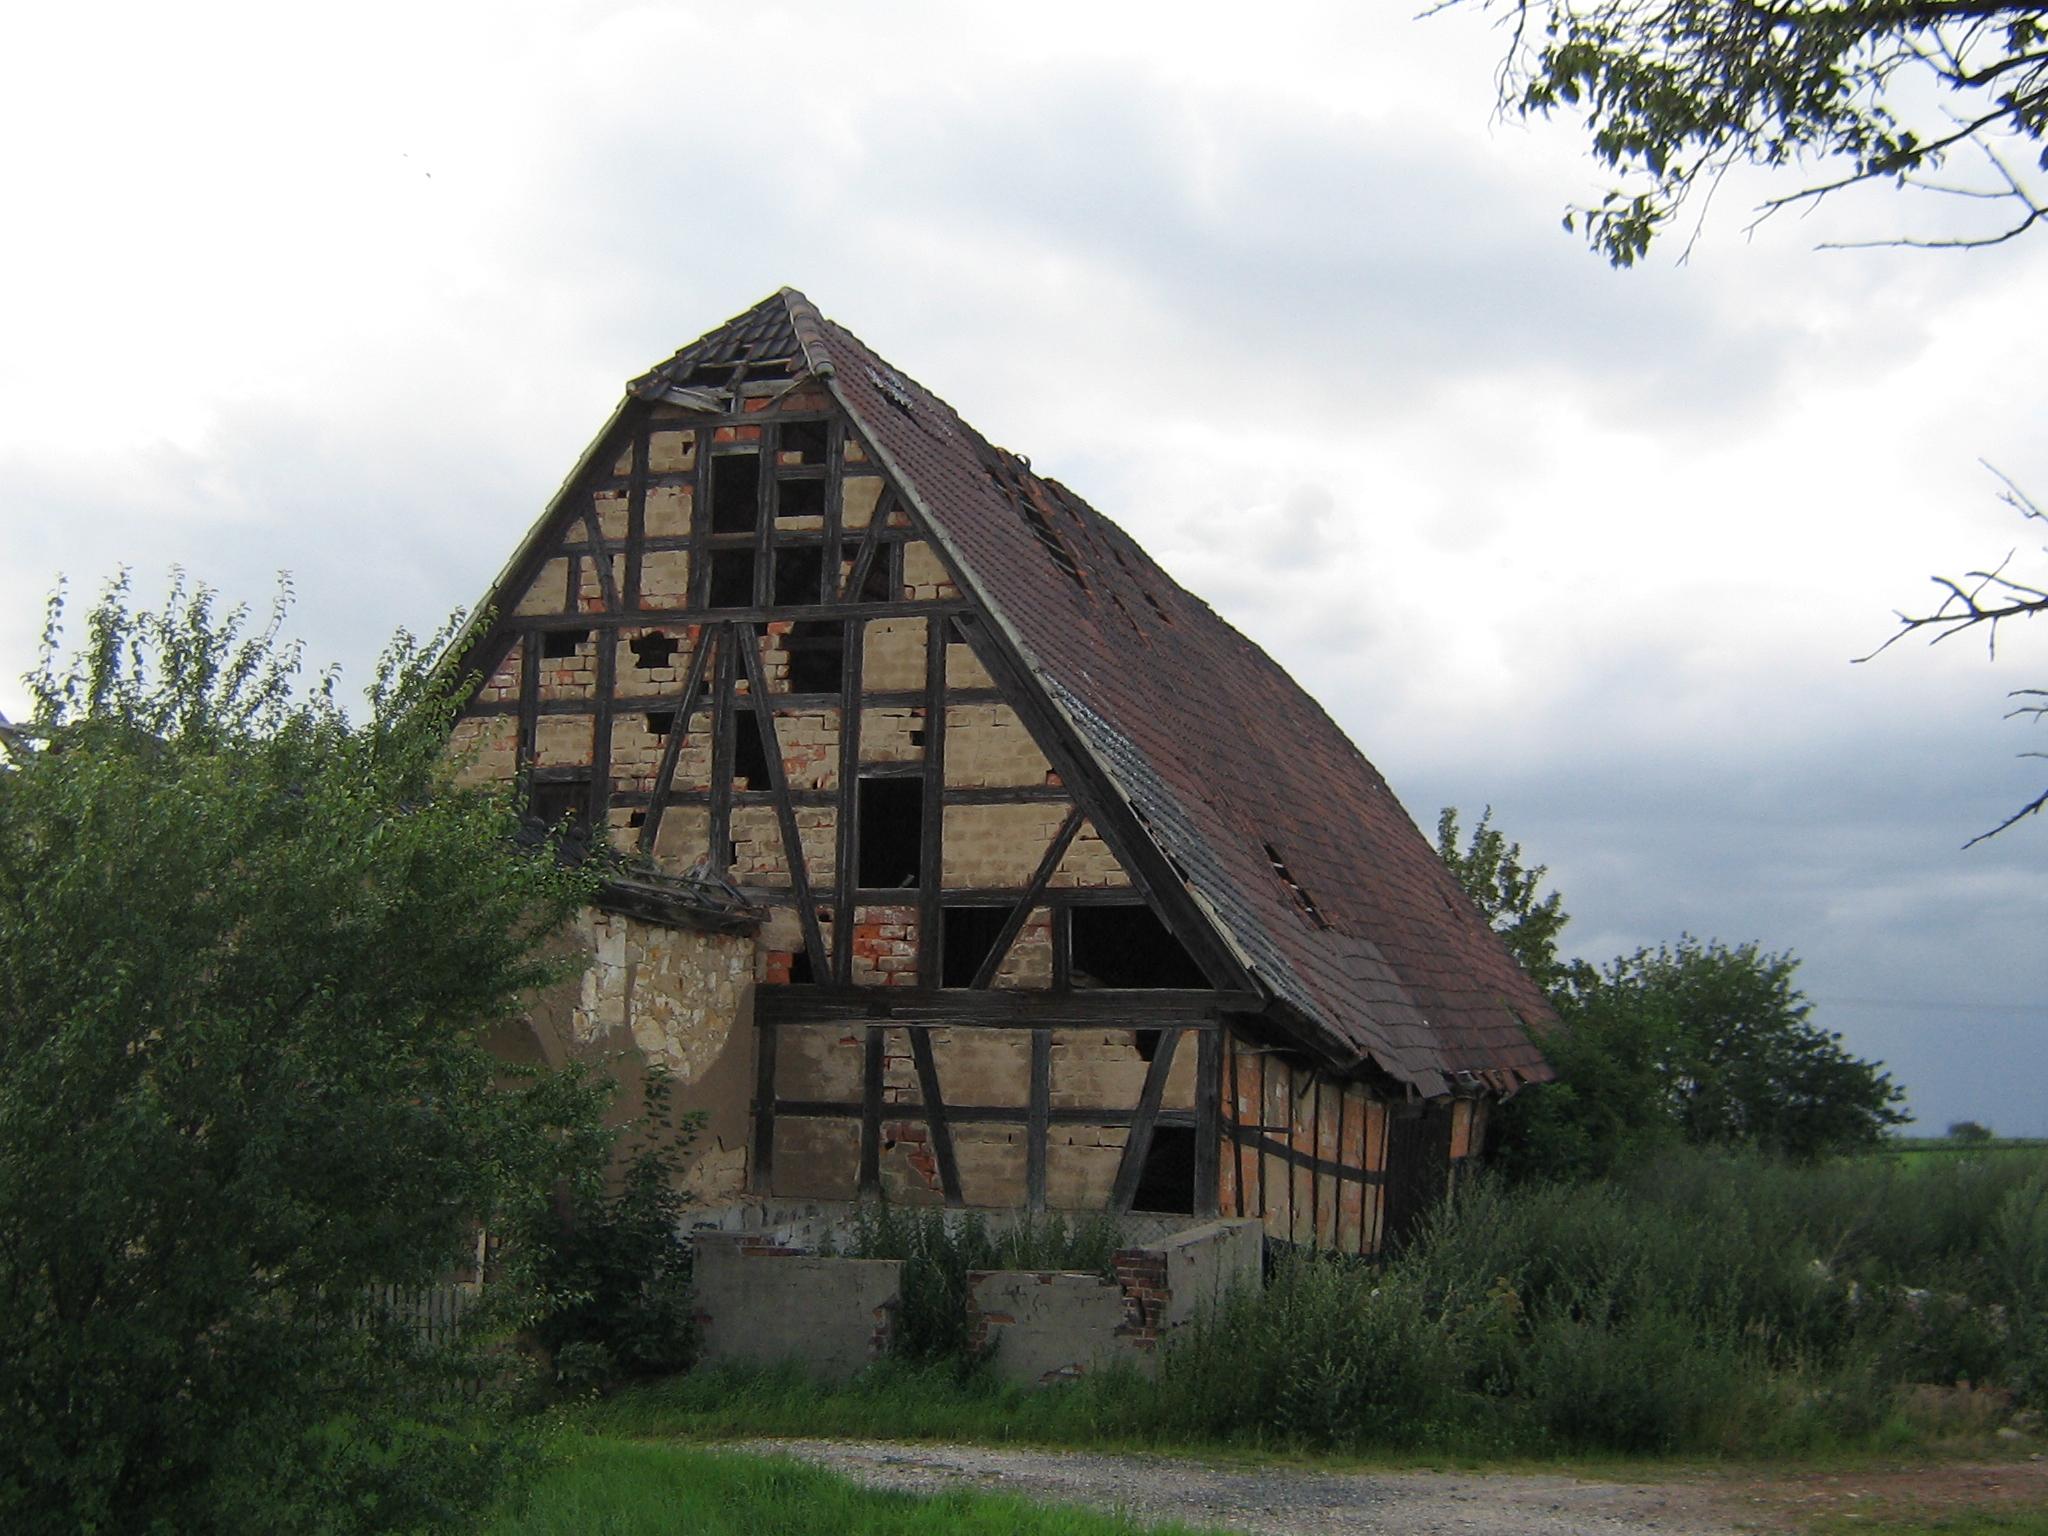 Hausverk Ufe altes haus bilder infos aus dem web